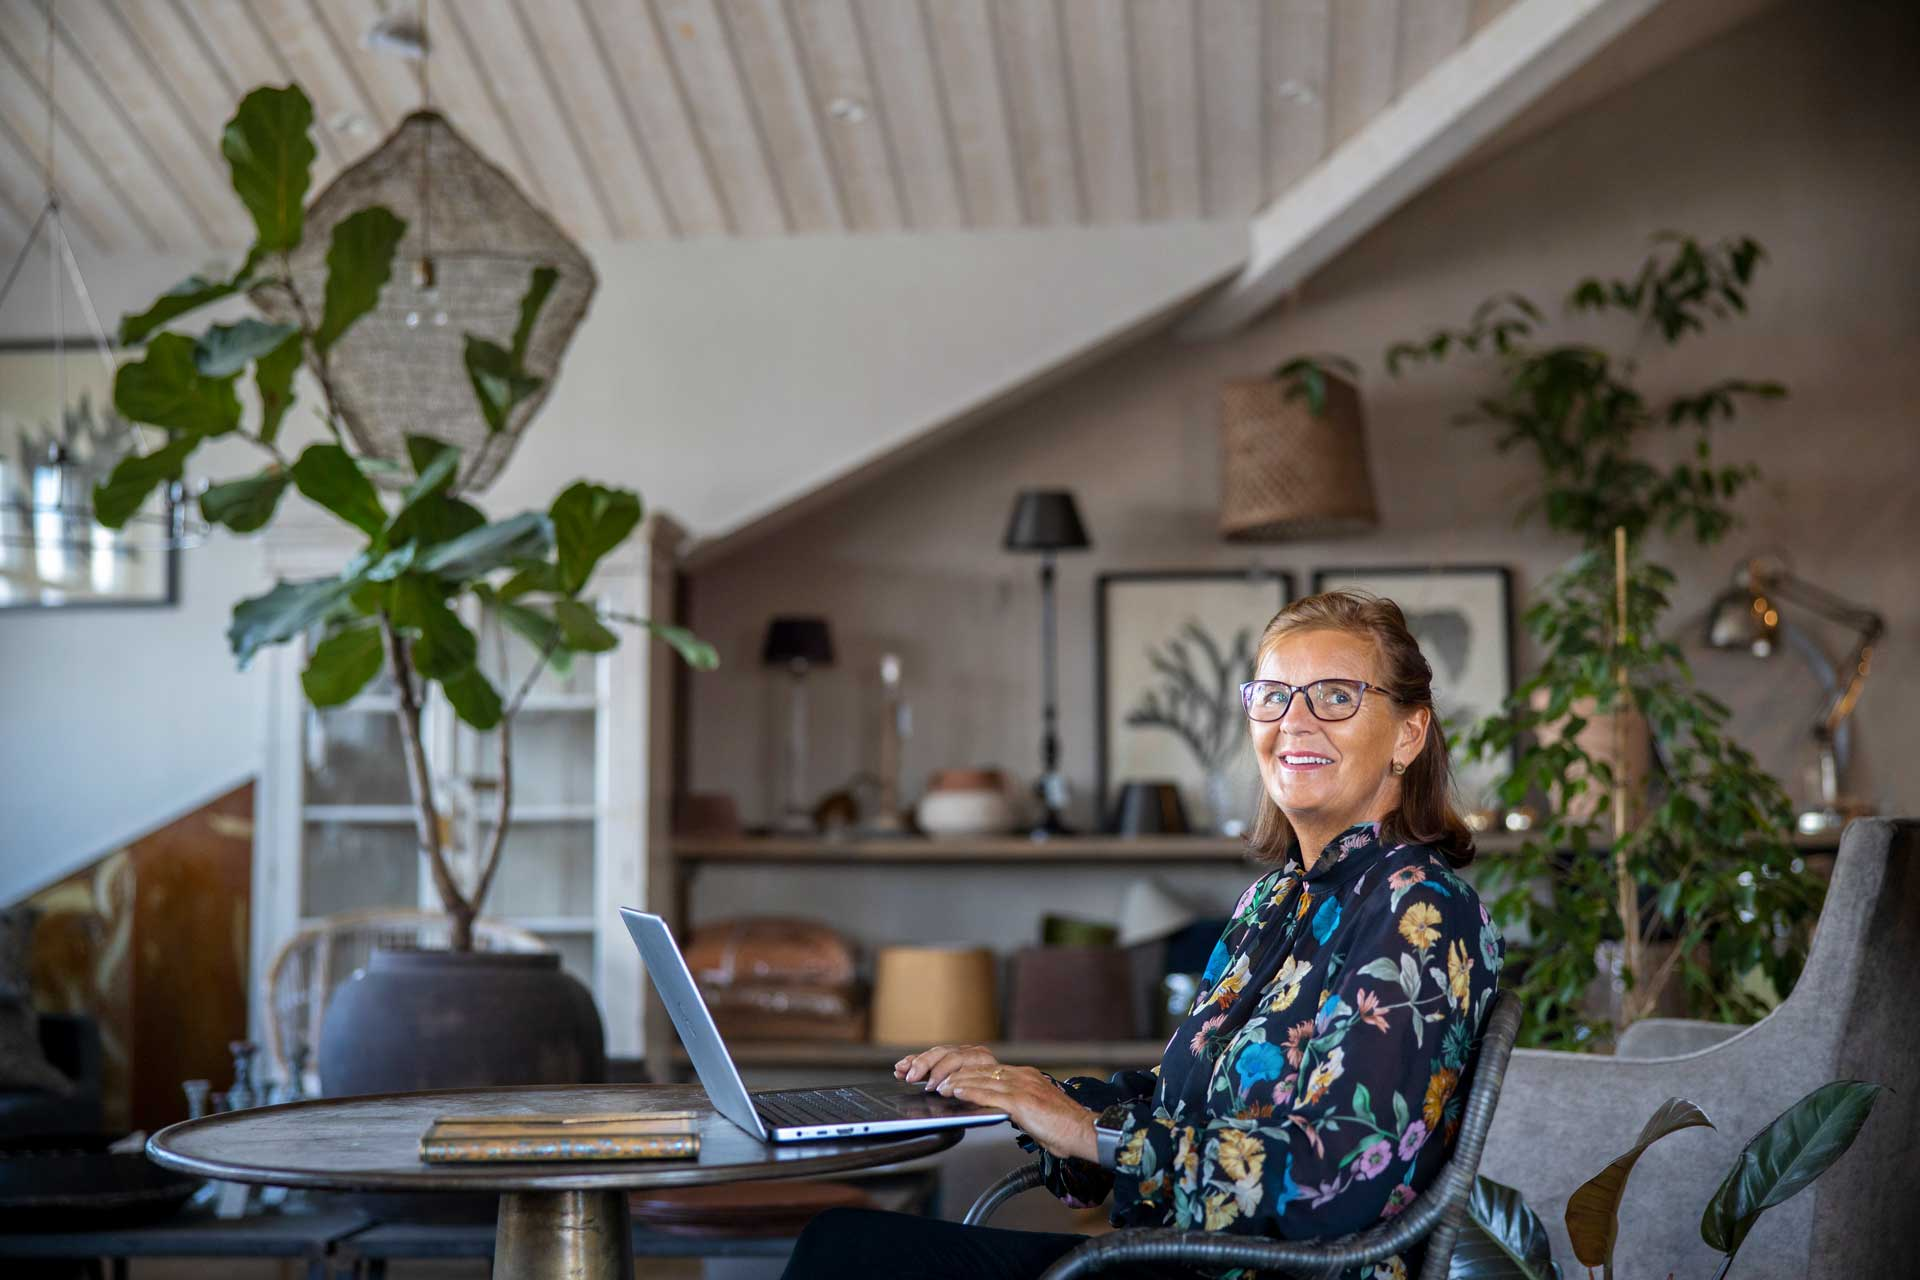 Ann-Sofie i cafémiljö